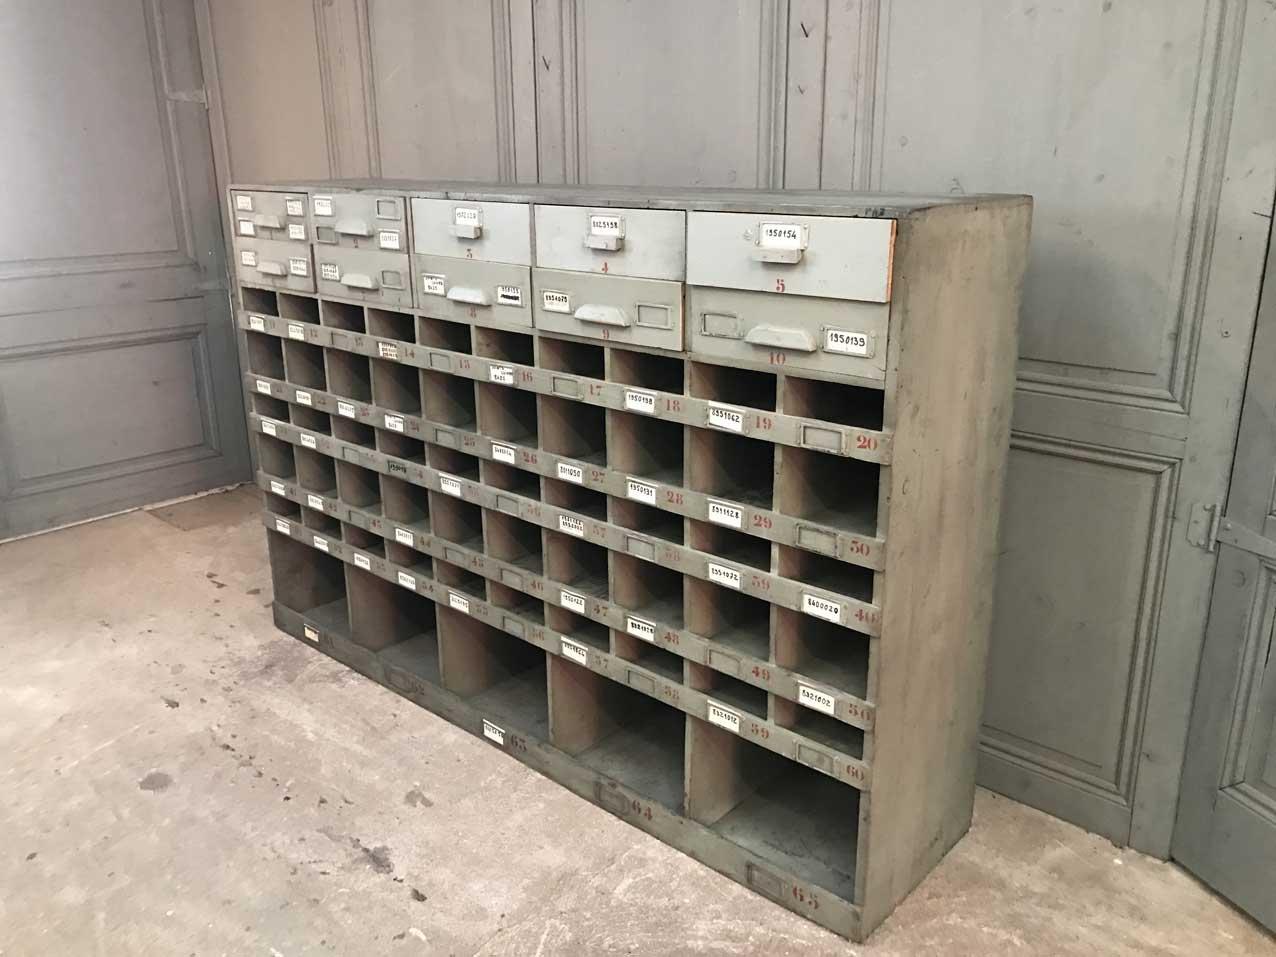 armoire de garage vintage en vente sur pamono. Black Bedroom Furniture Sets. Home Design Ideas